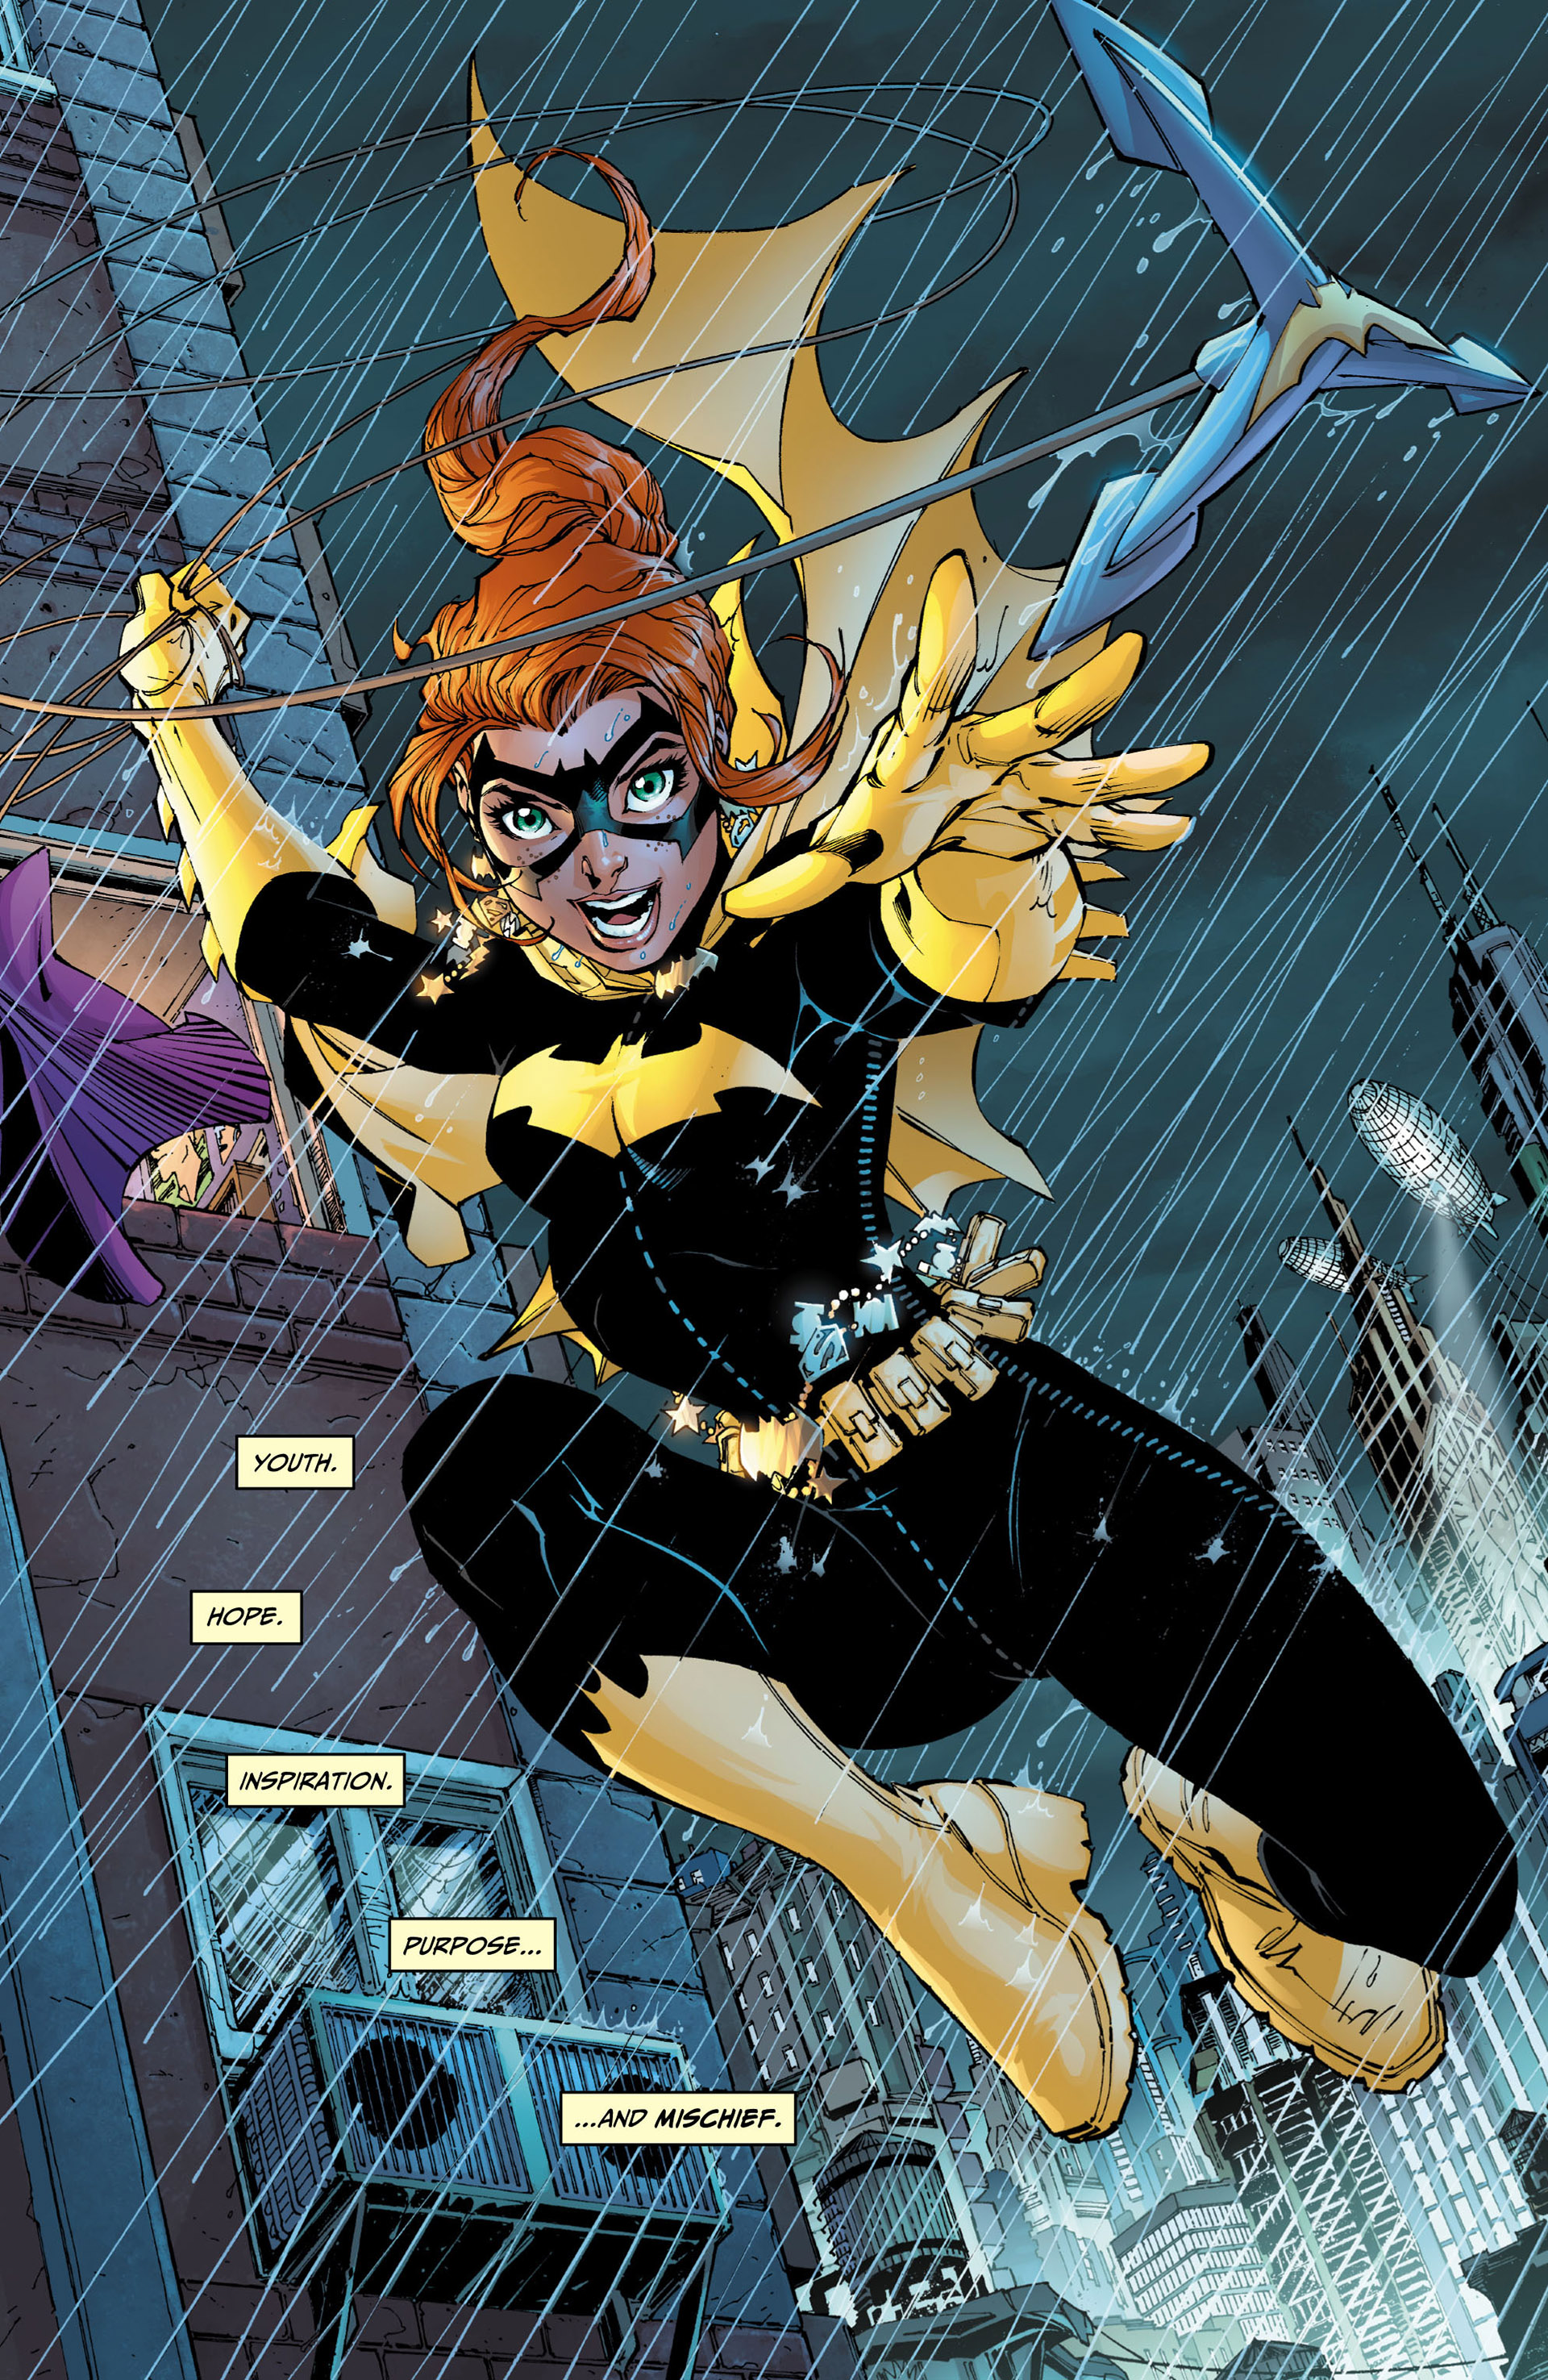 Read online All Star Batman & Robin, The Boy Wonder comic -  Issue #6 - 10